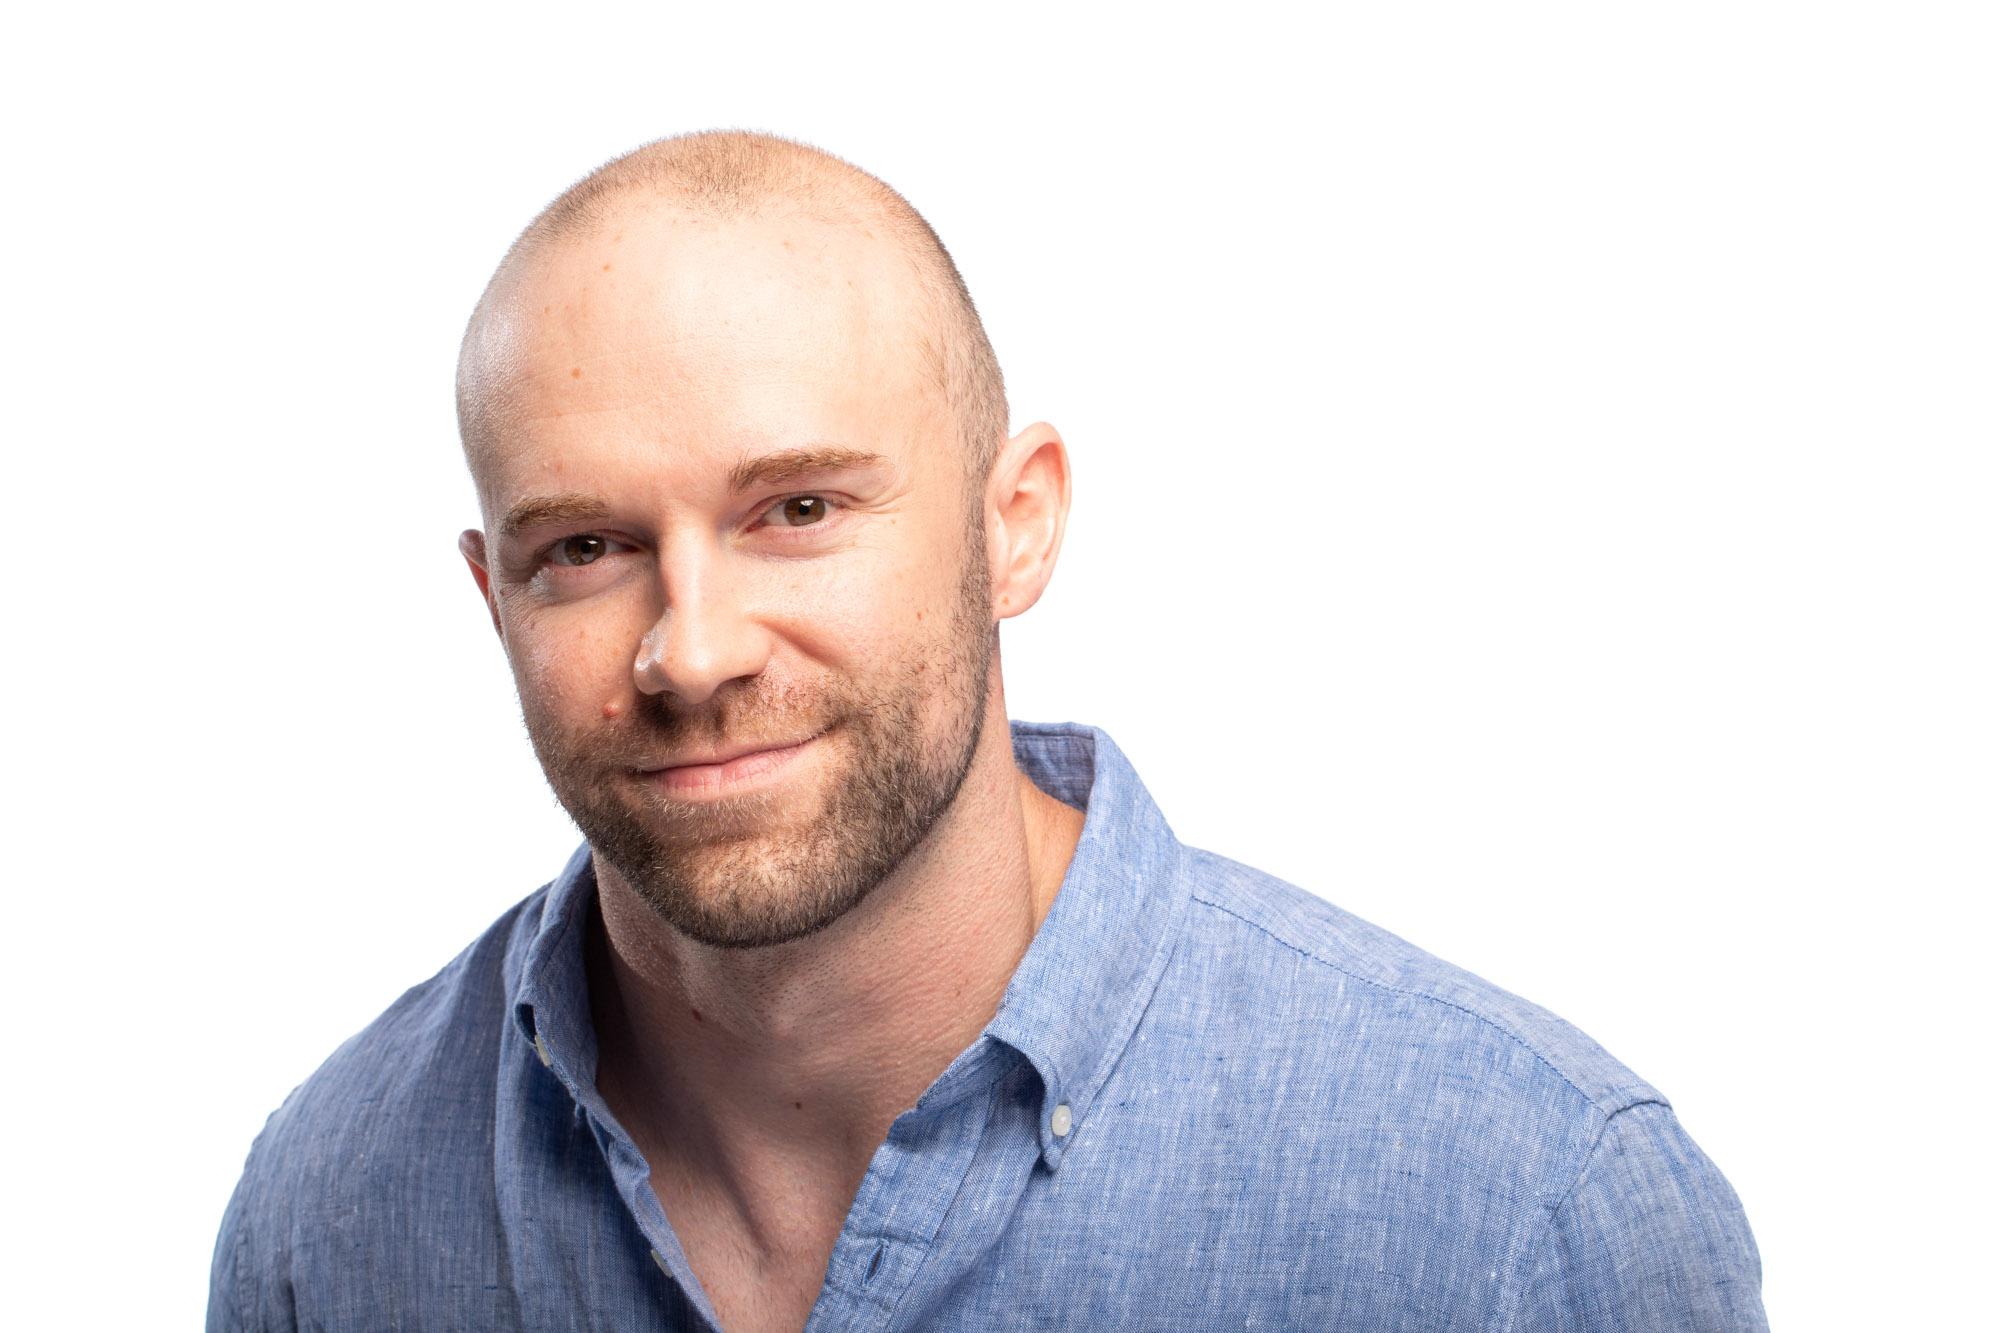 Director of Software Eric Cavazos